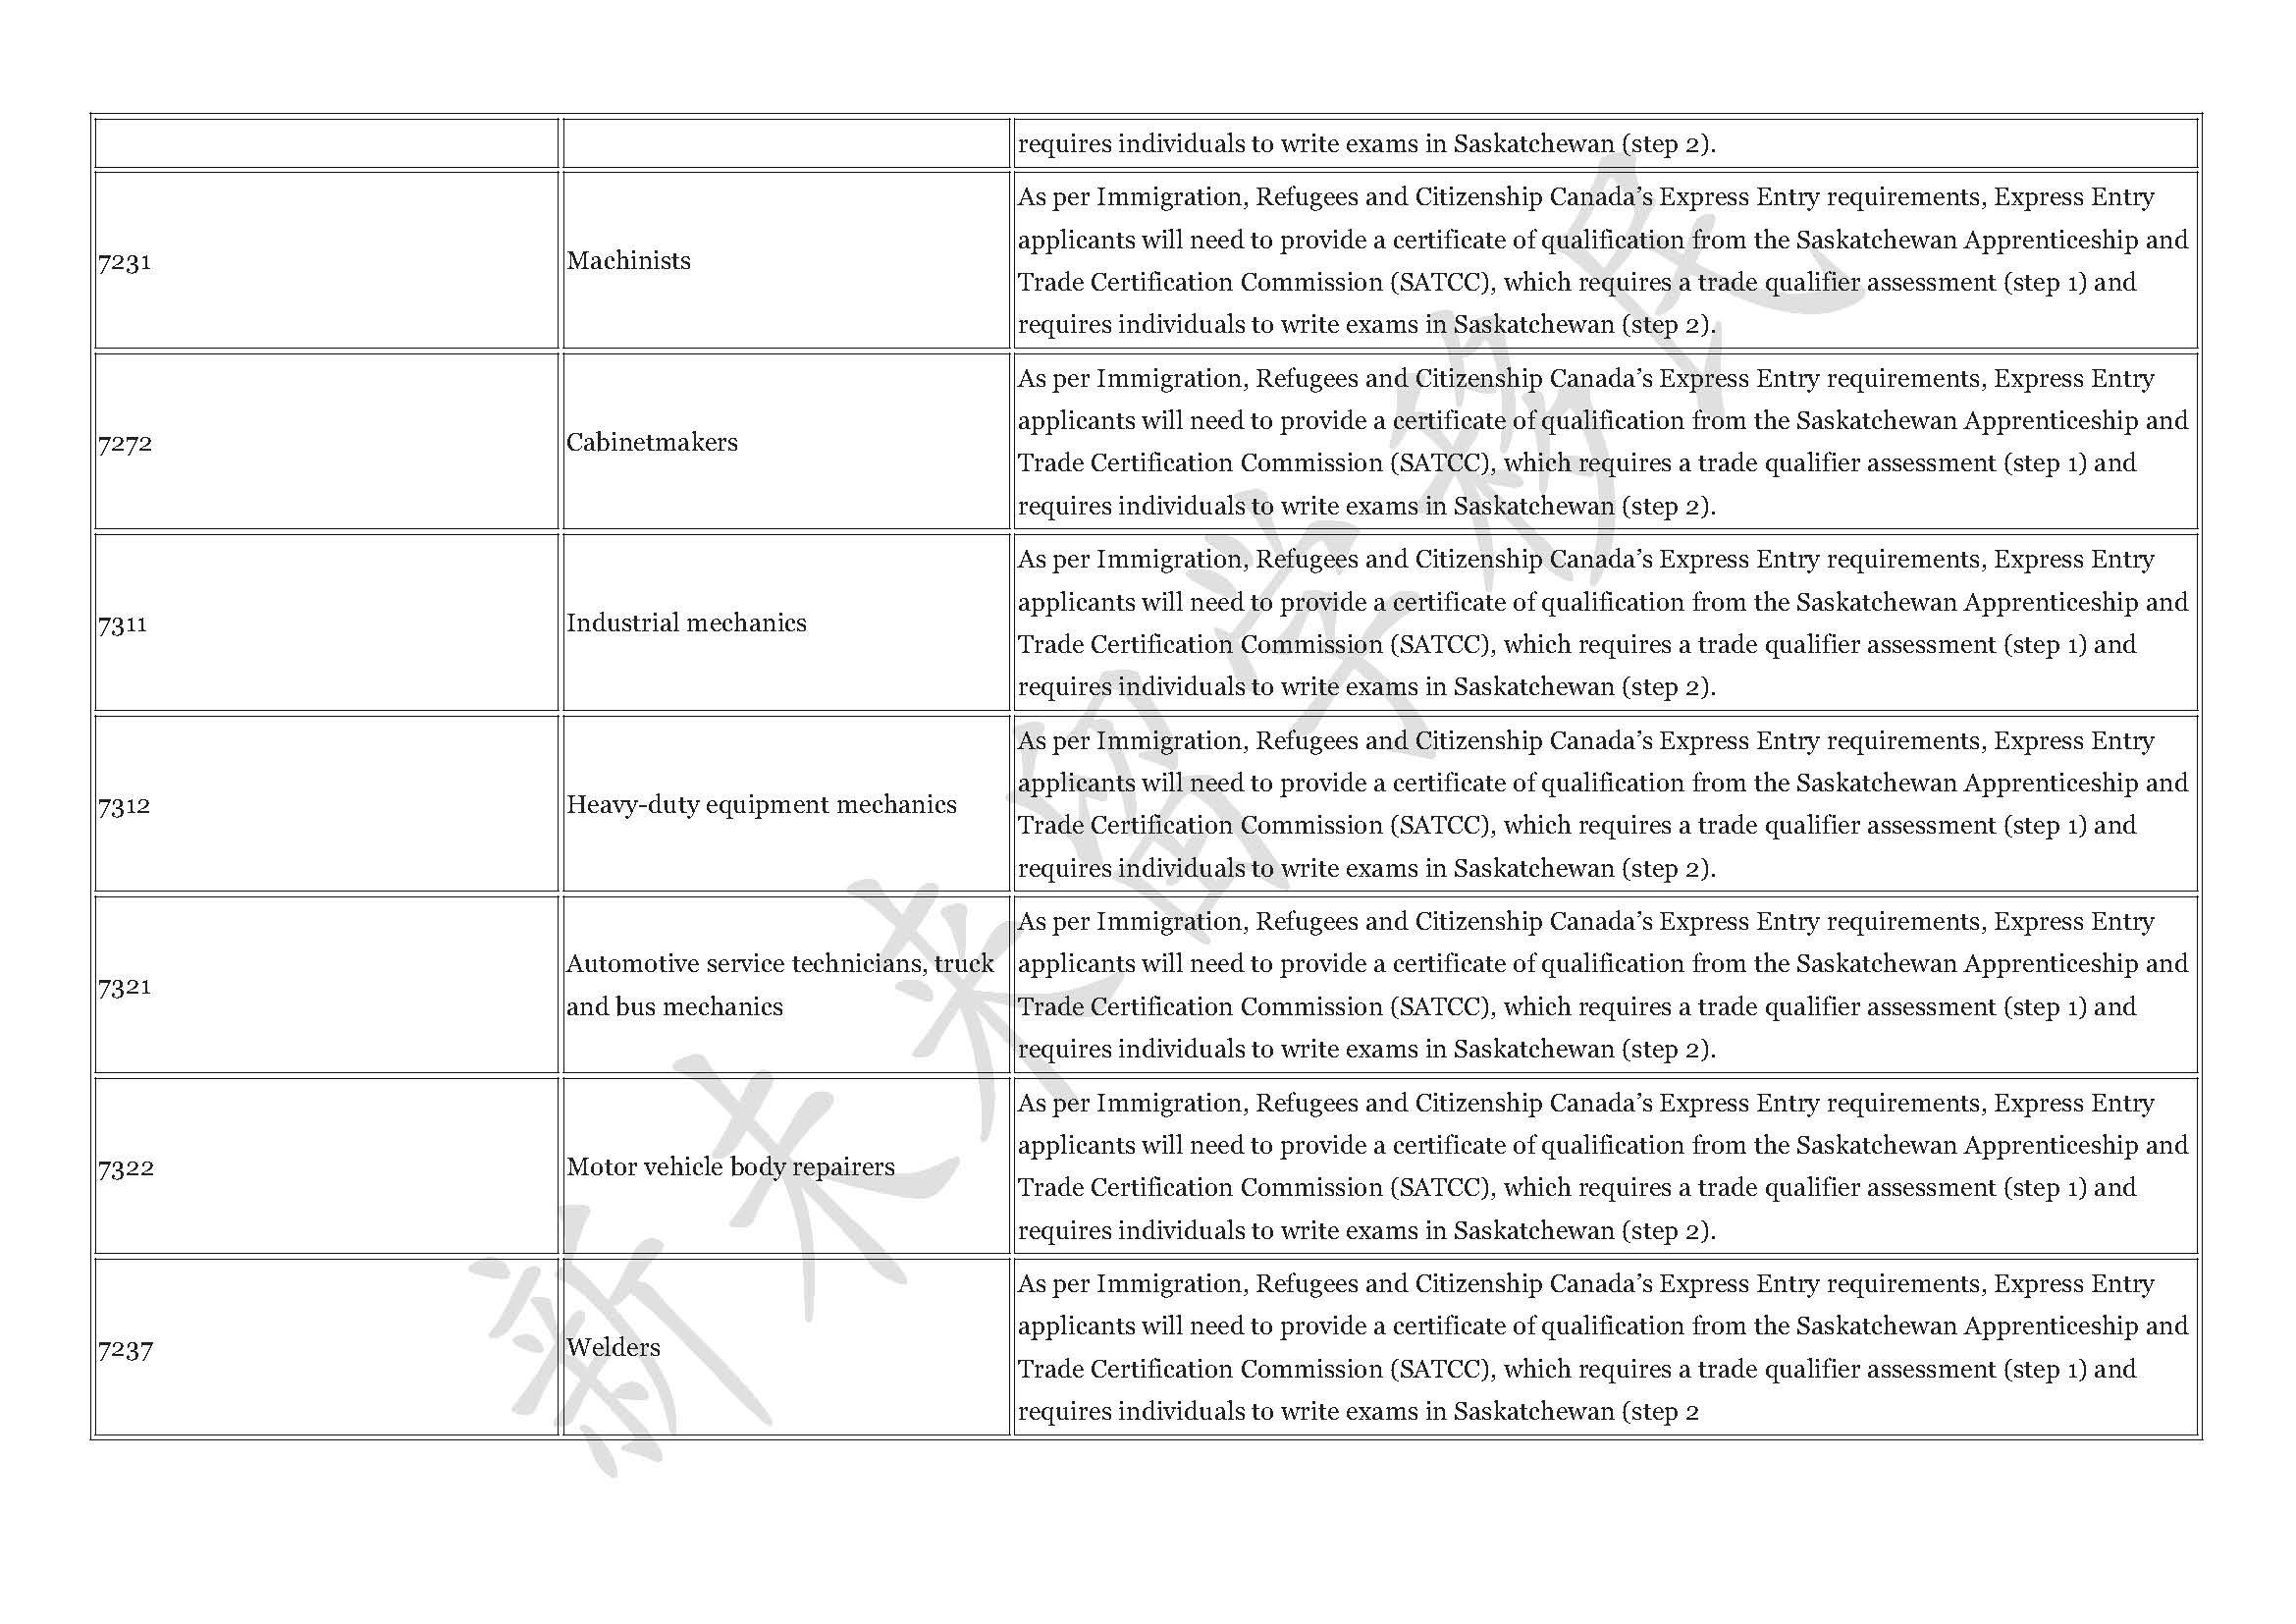 2017.7 occupation list-licensure 3